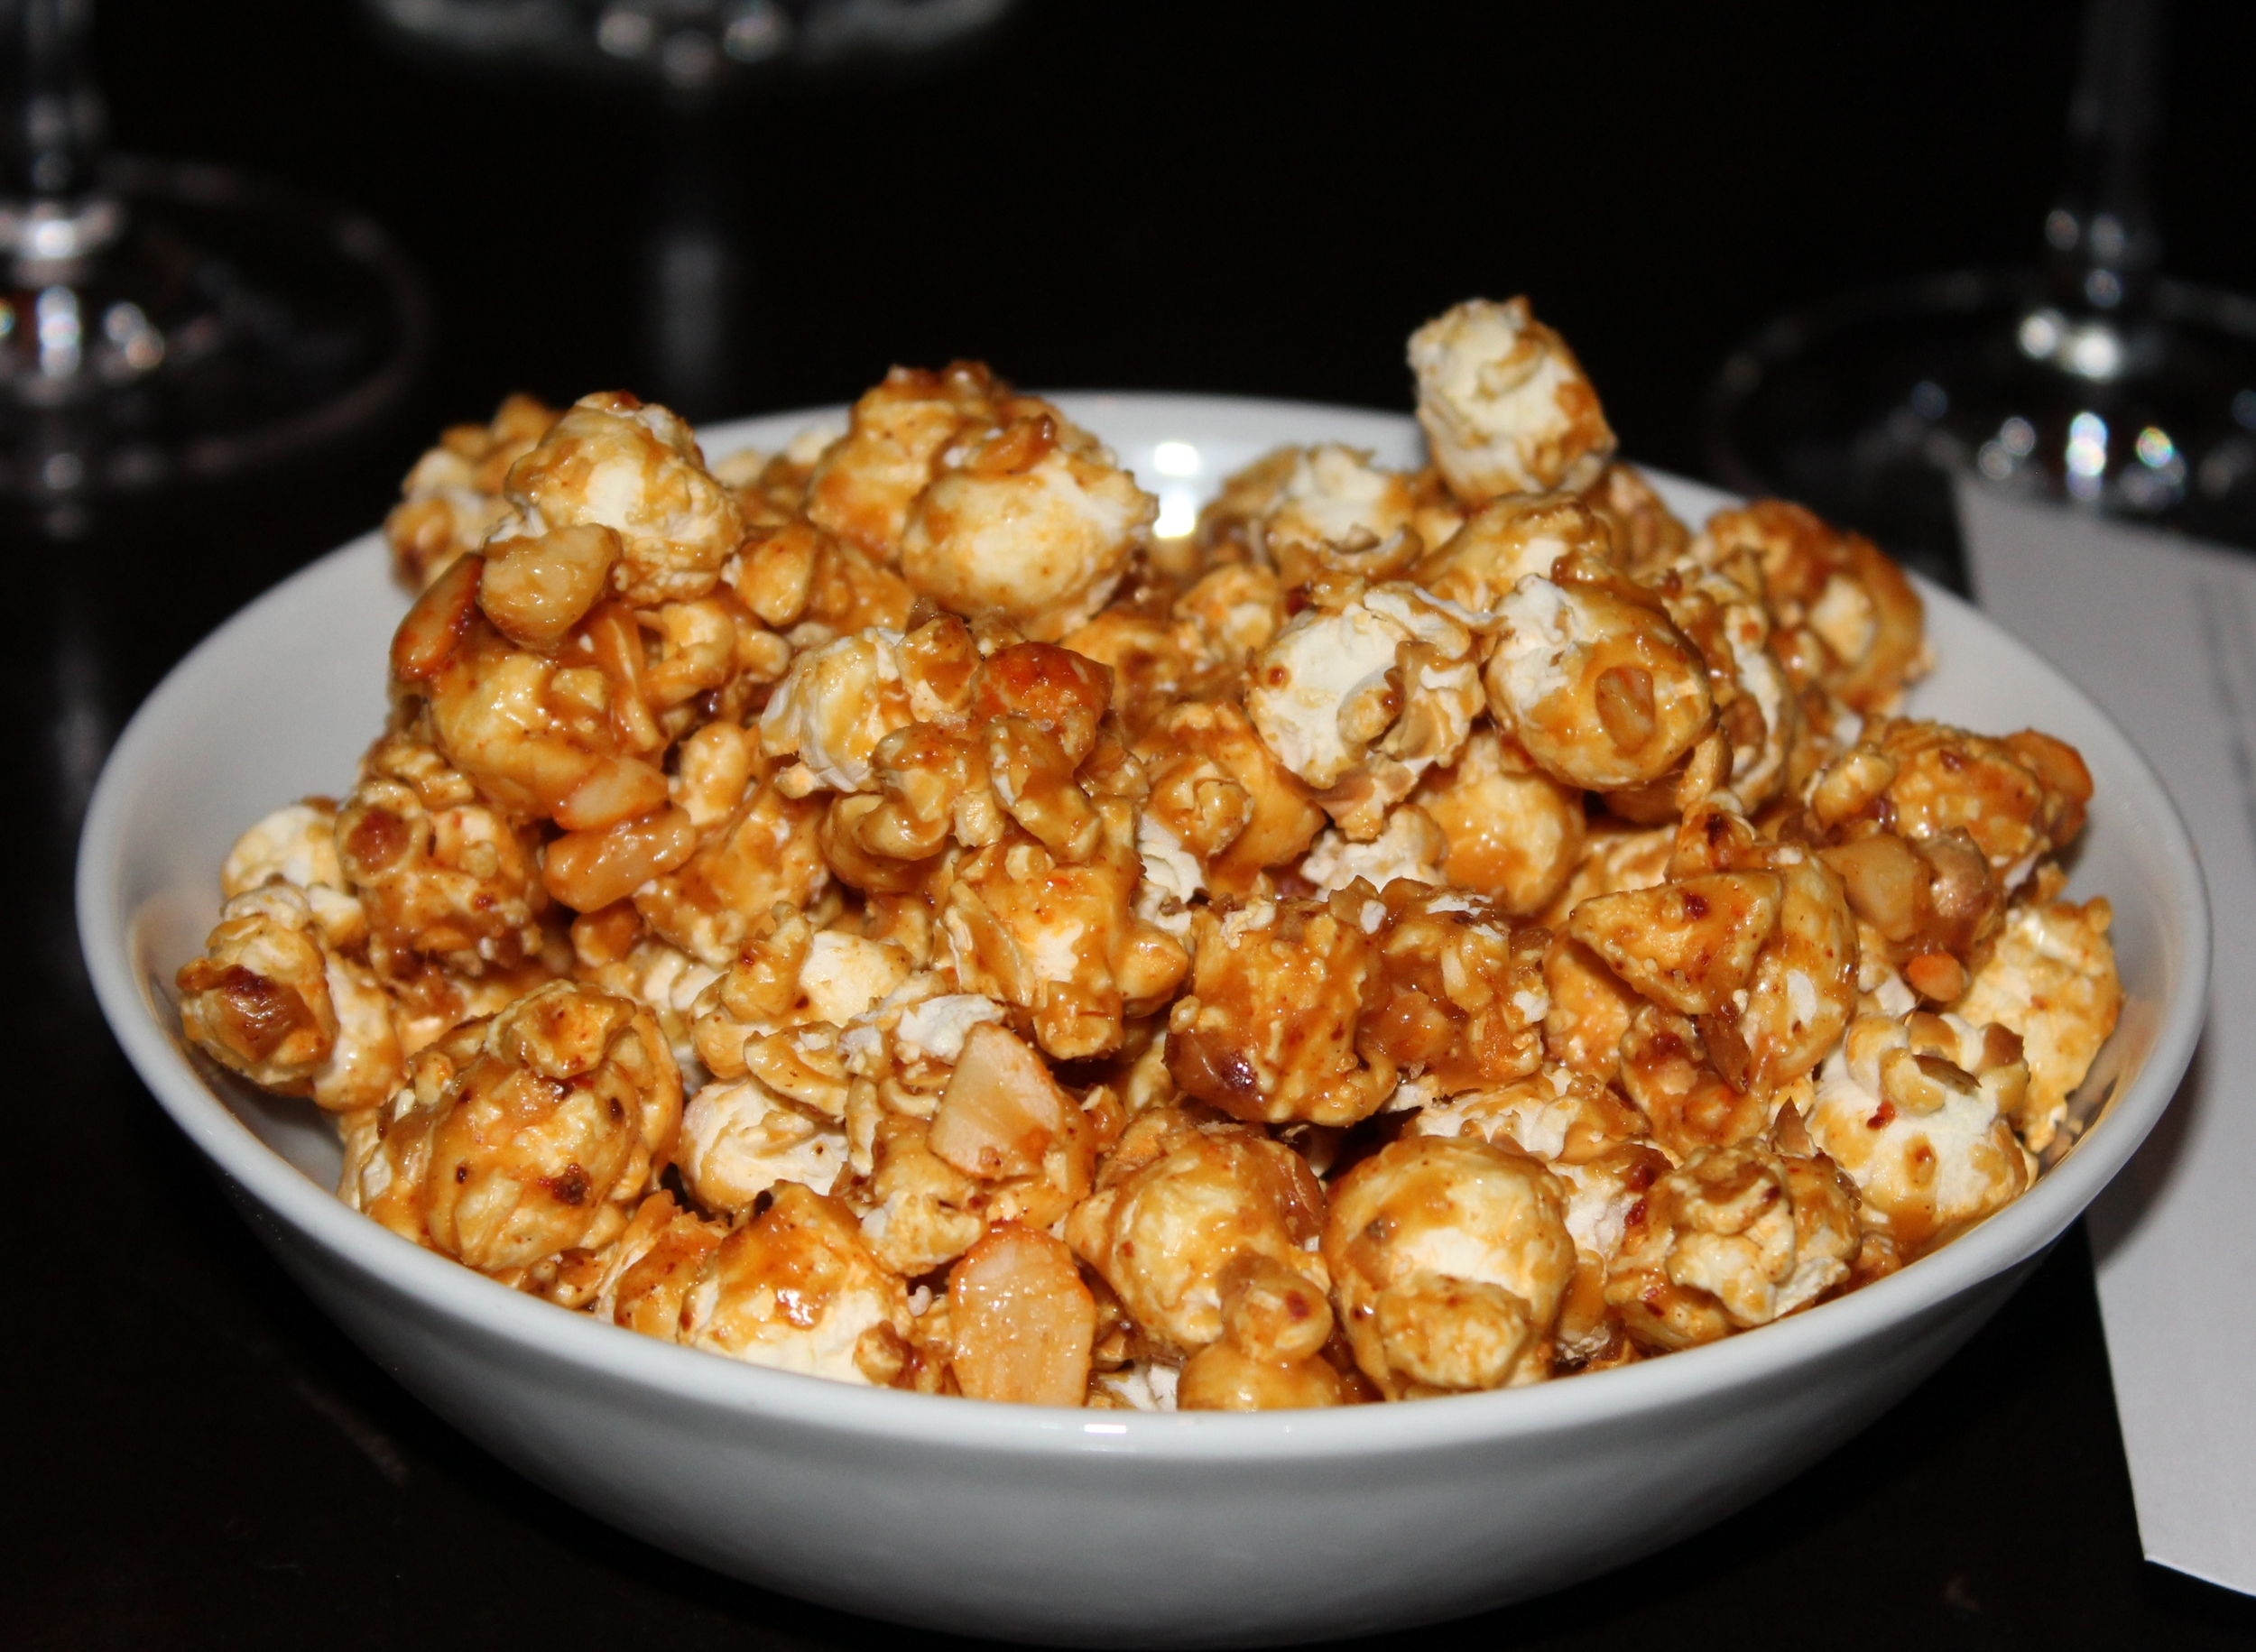 Caramel-bacon popcorn